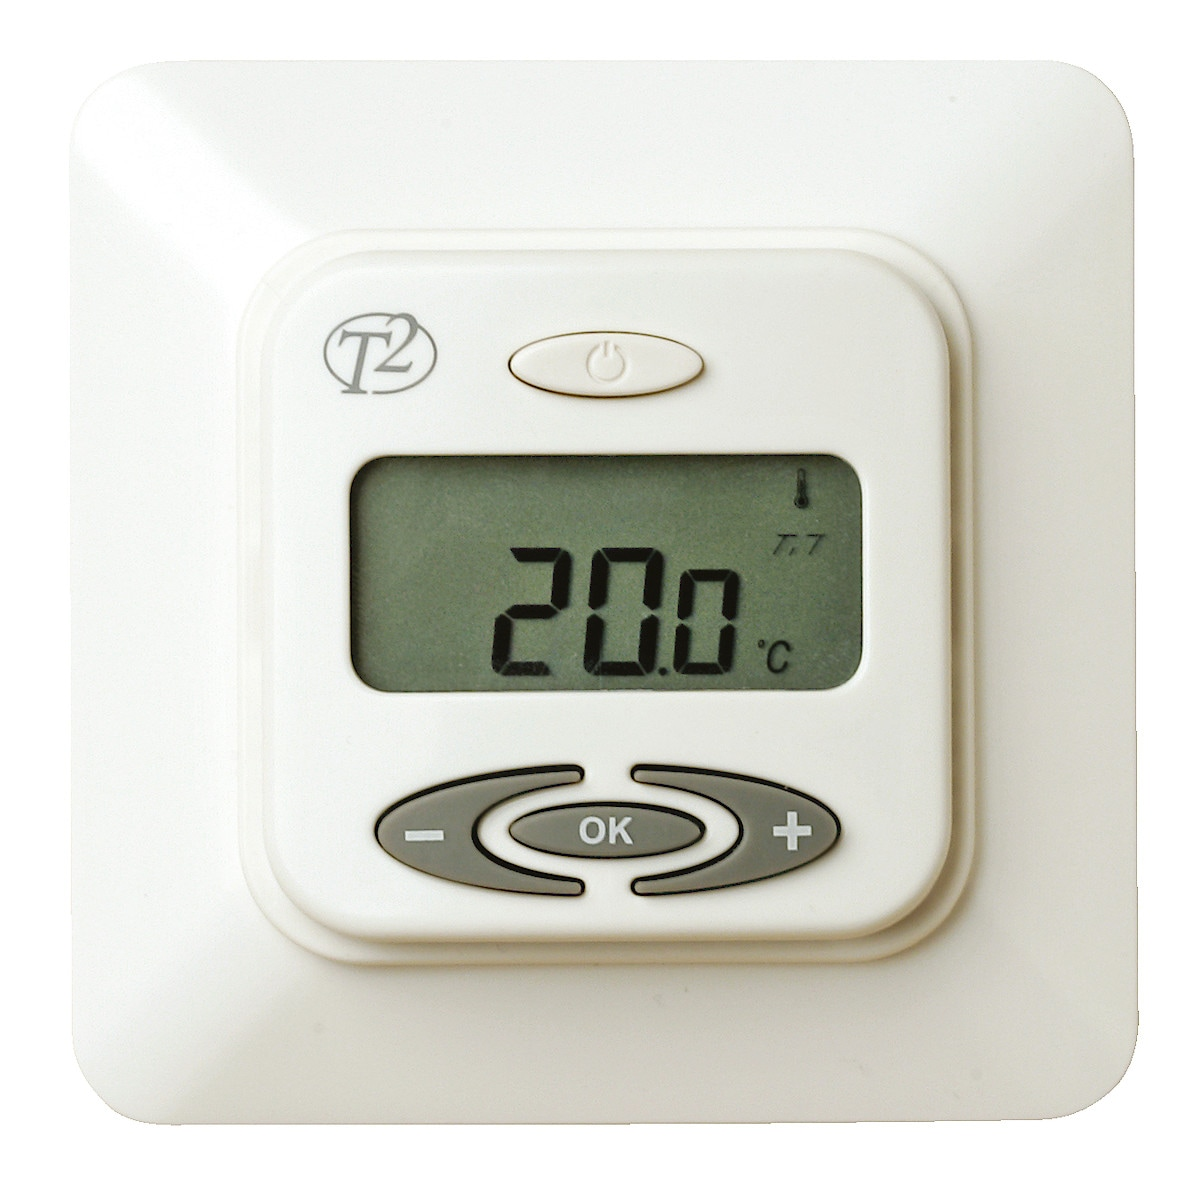 Termostat, T2FloorTemp Plusº for gulvvarme